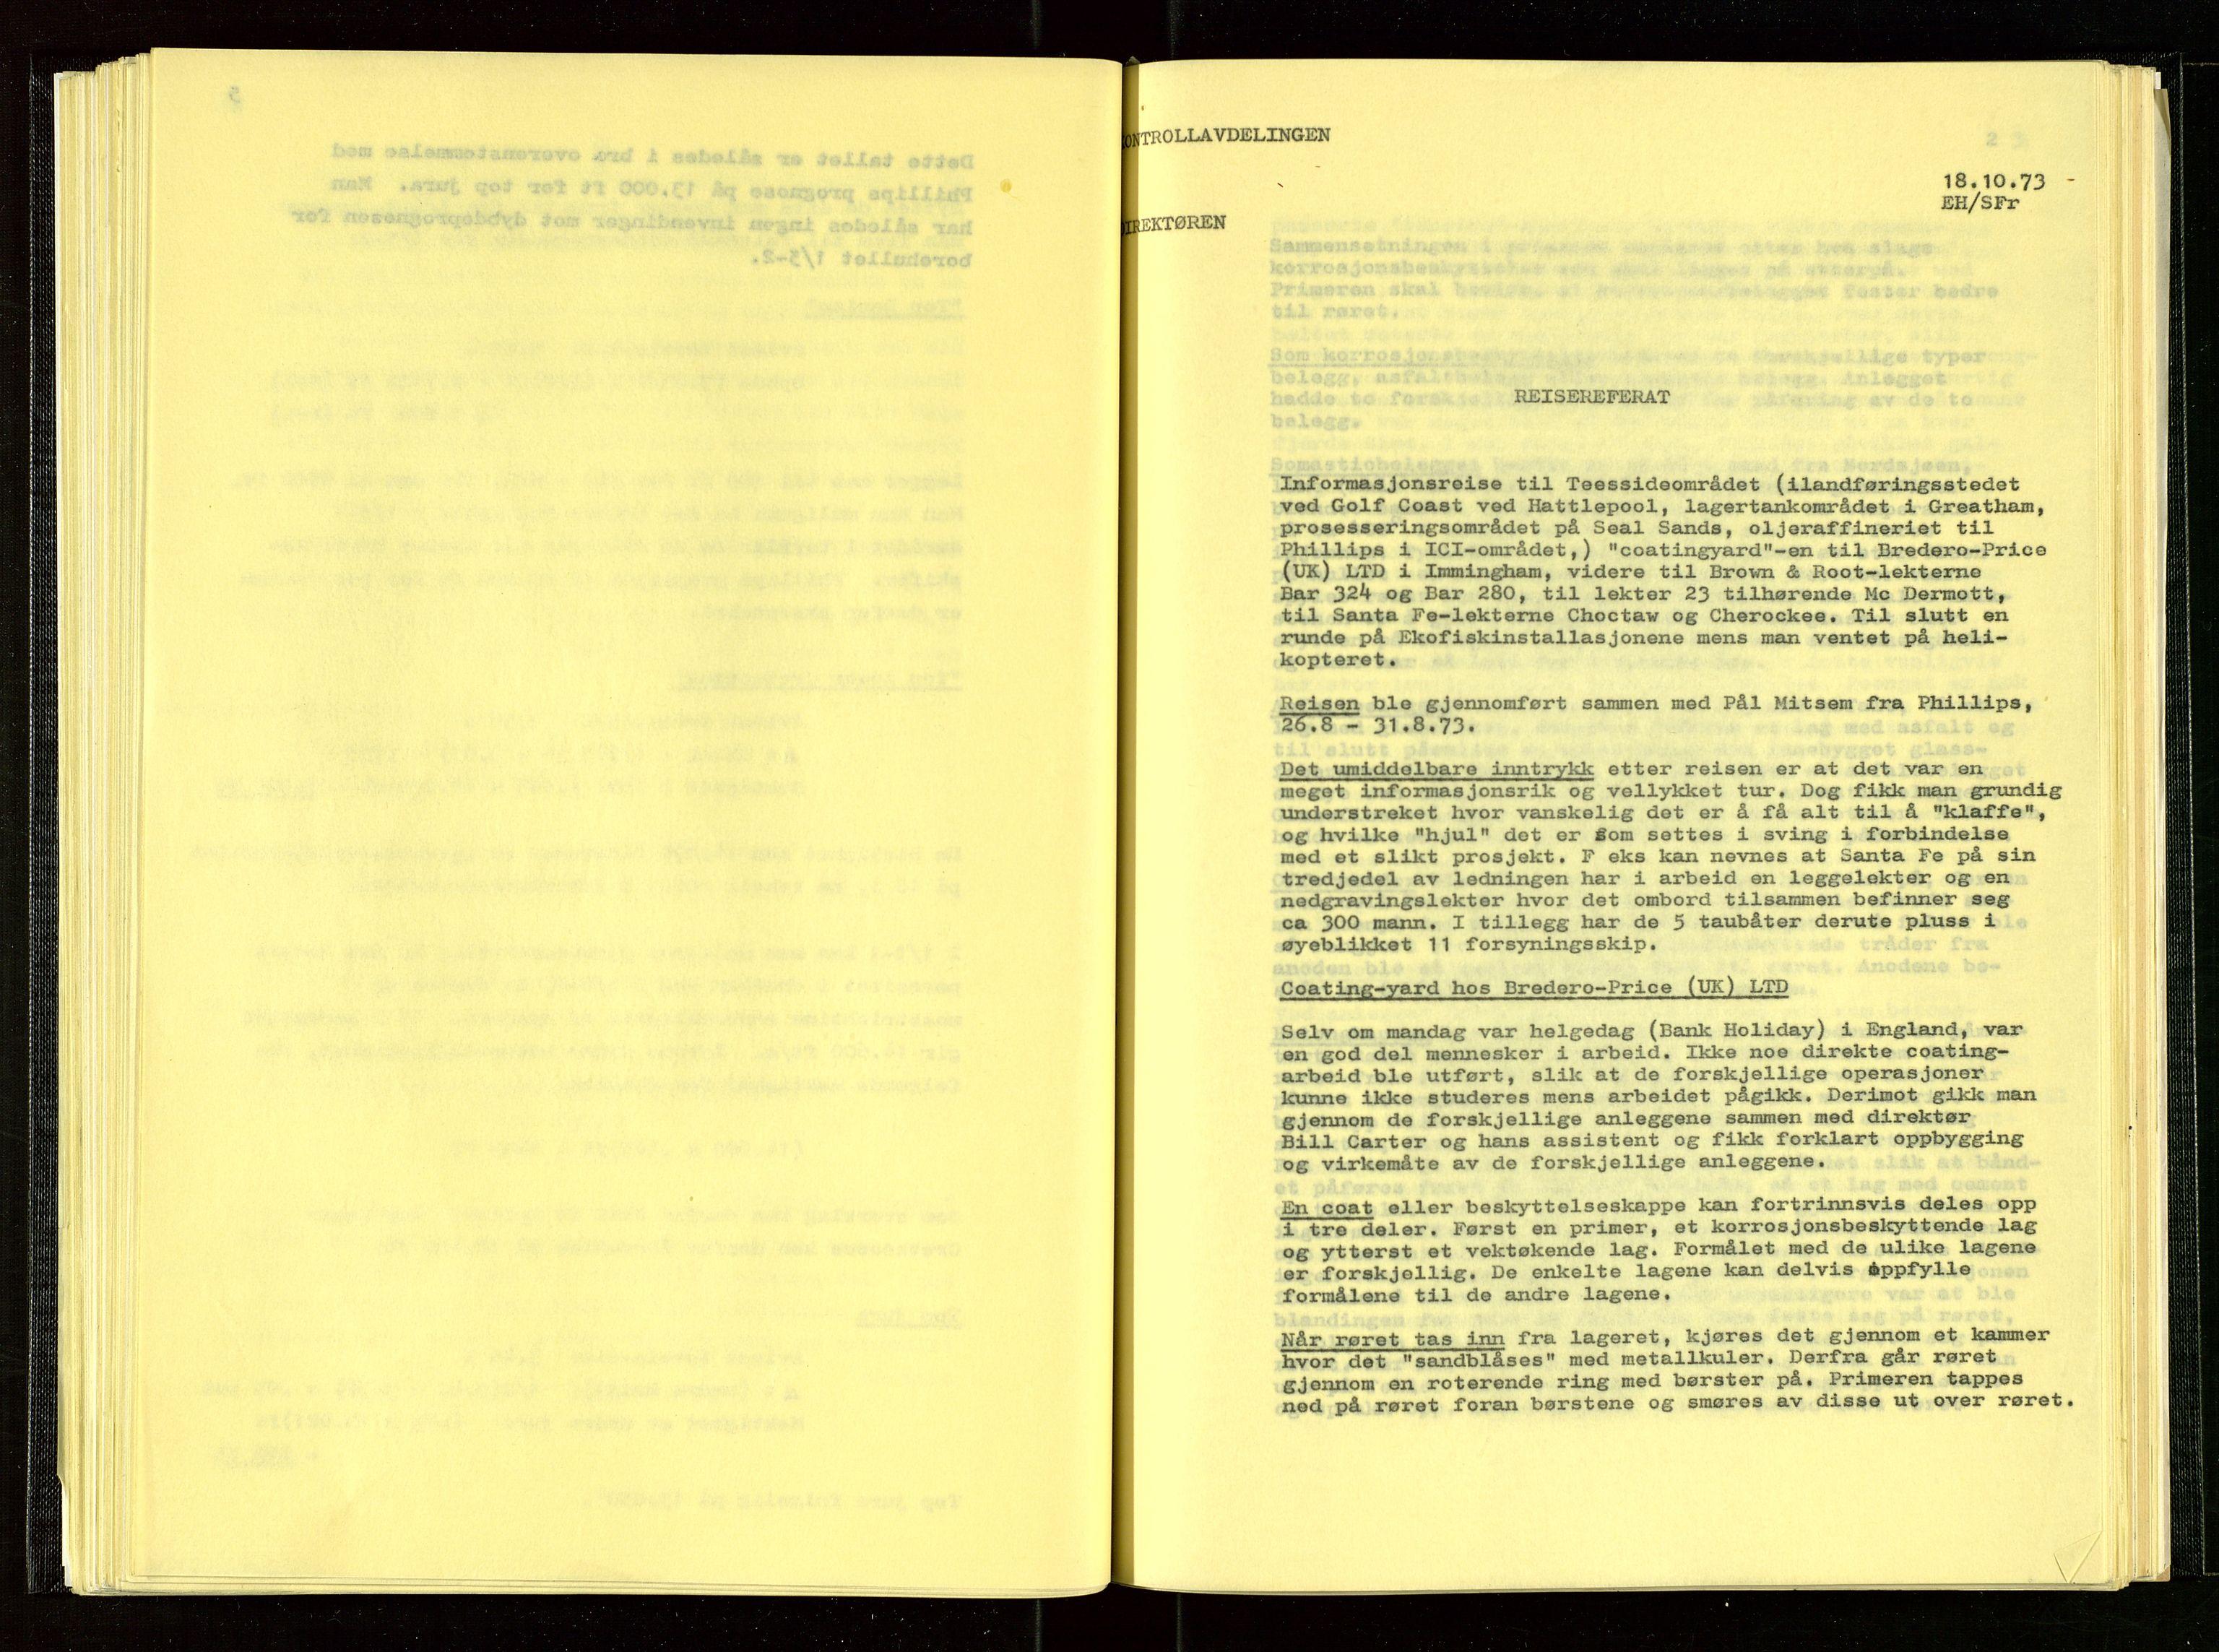 SAST, Oljedirektoratet, Aa/L0001: Referatprotokoller, 1973